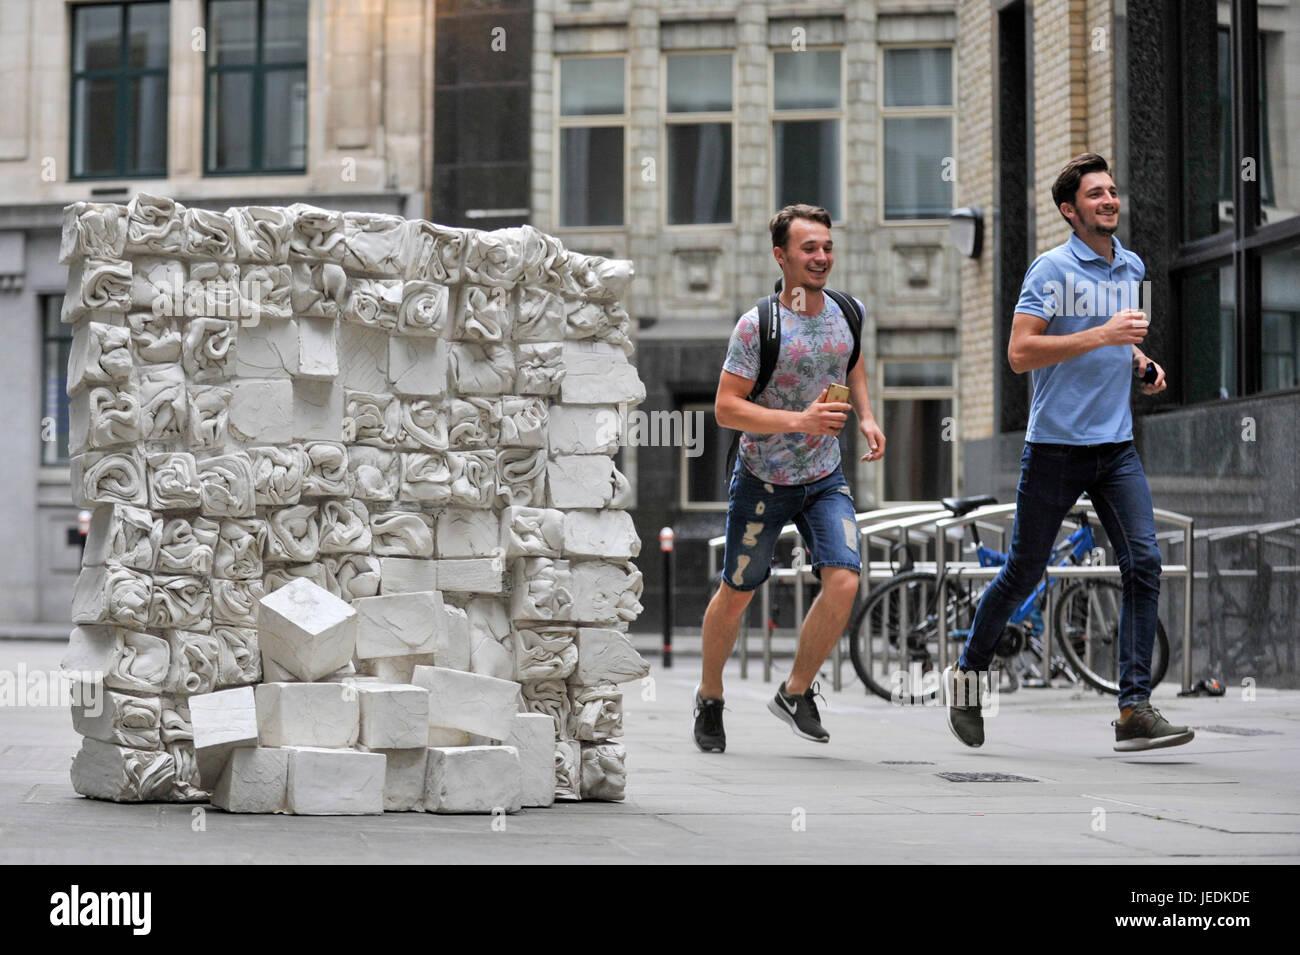 London, UK.  24 June 2017. Boys run past 'Reminiscence', 2017, by Fernando Casasempere.  The artwork is - Stock Image